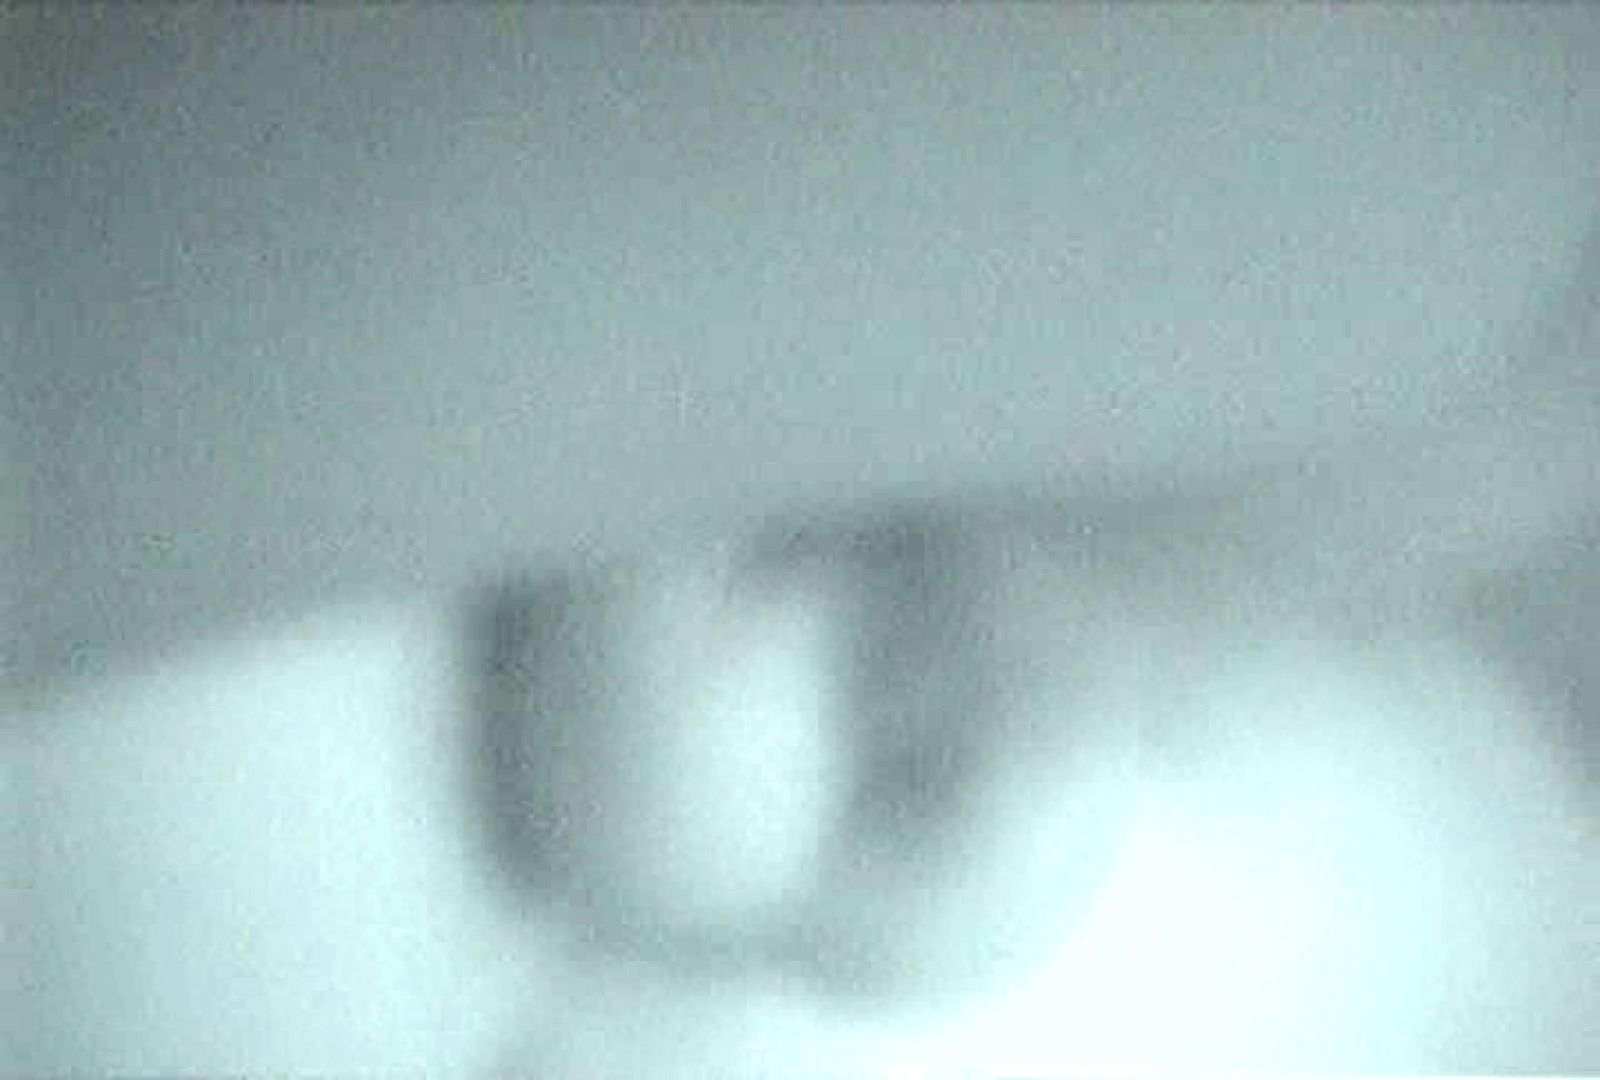 充血監督の深夜の運動会Vol.88 細身 戯れ無修正画像 73画像 49